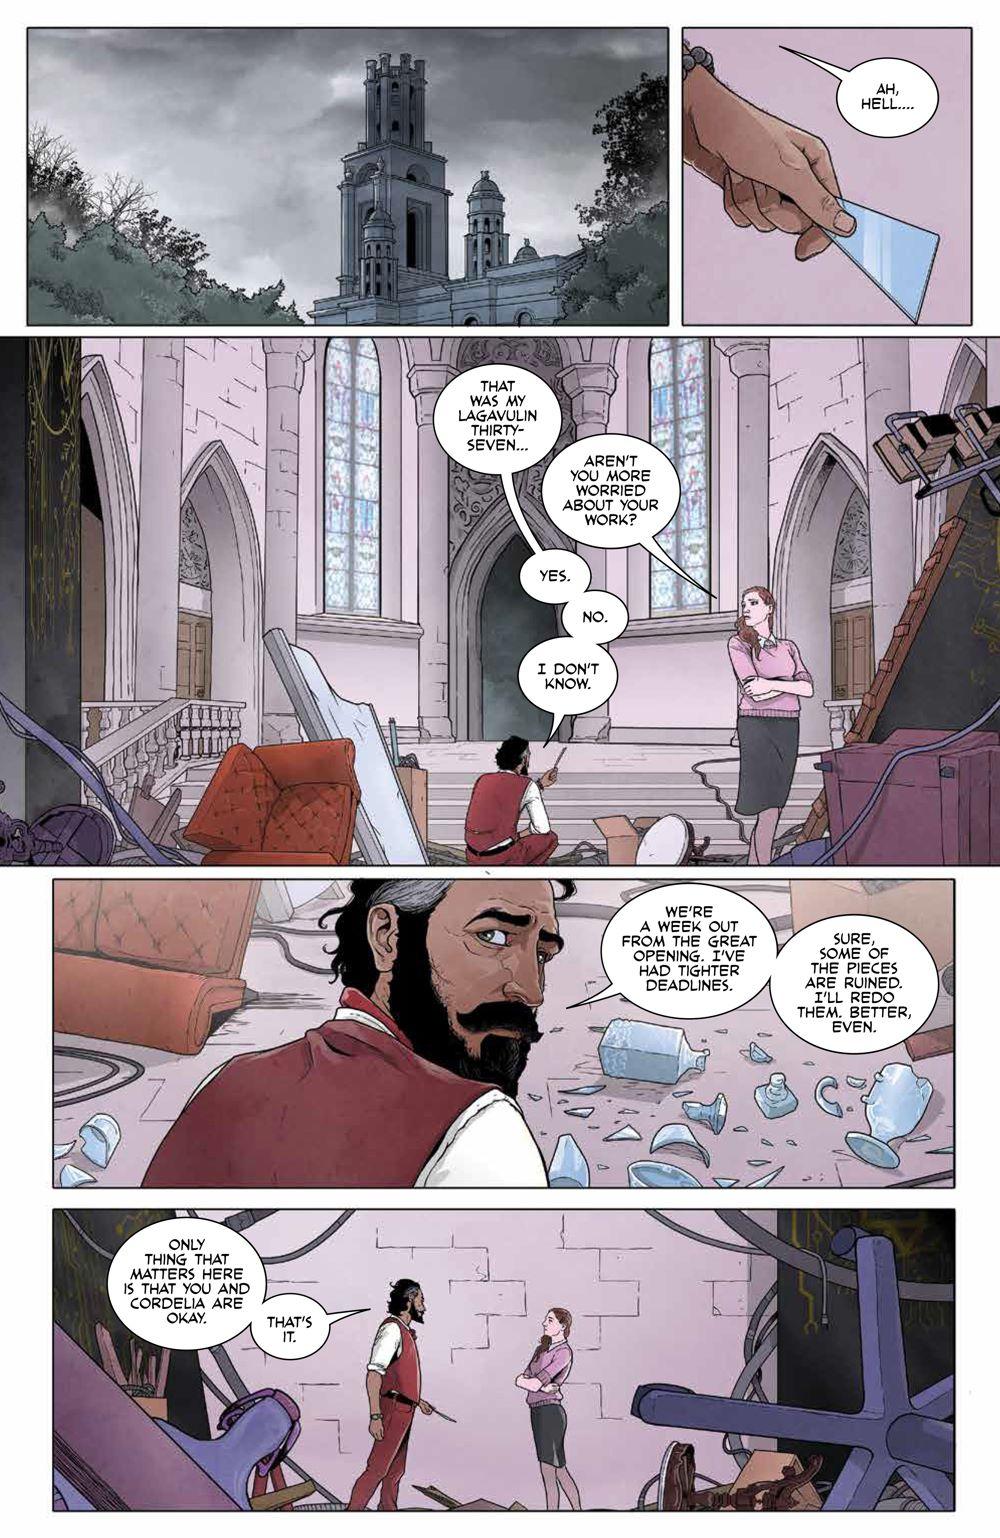 RedMother_v3_SC_PRESS_18 ComicList Previews: RED MOTHER VOLUME 3 TP